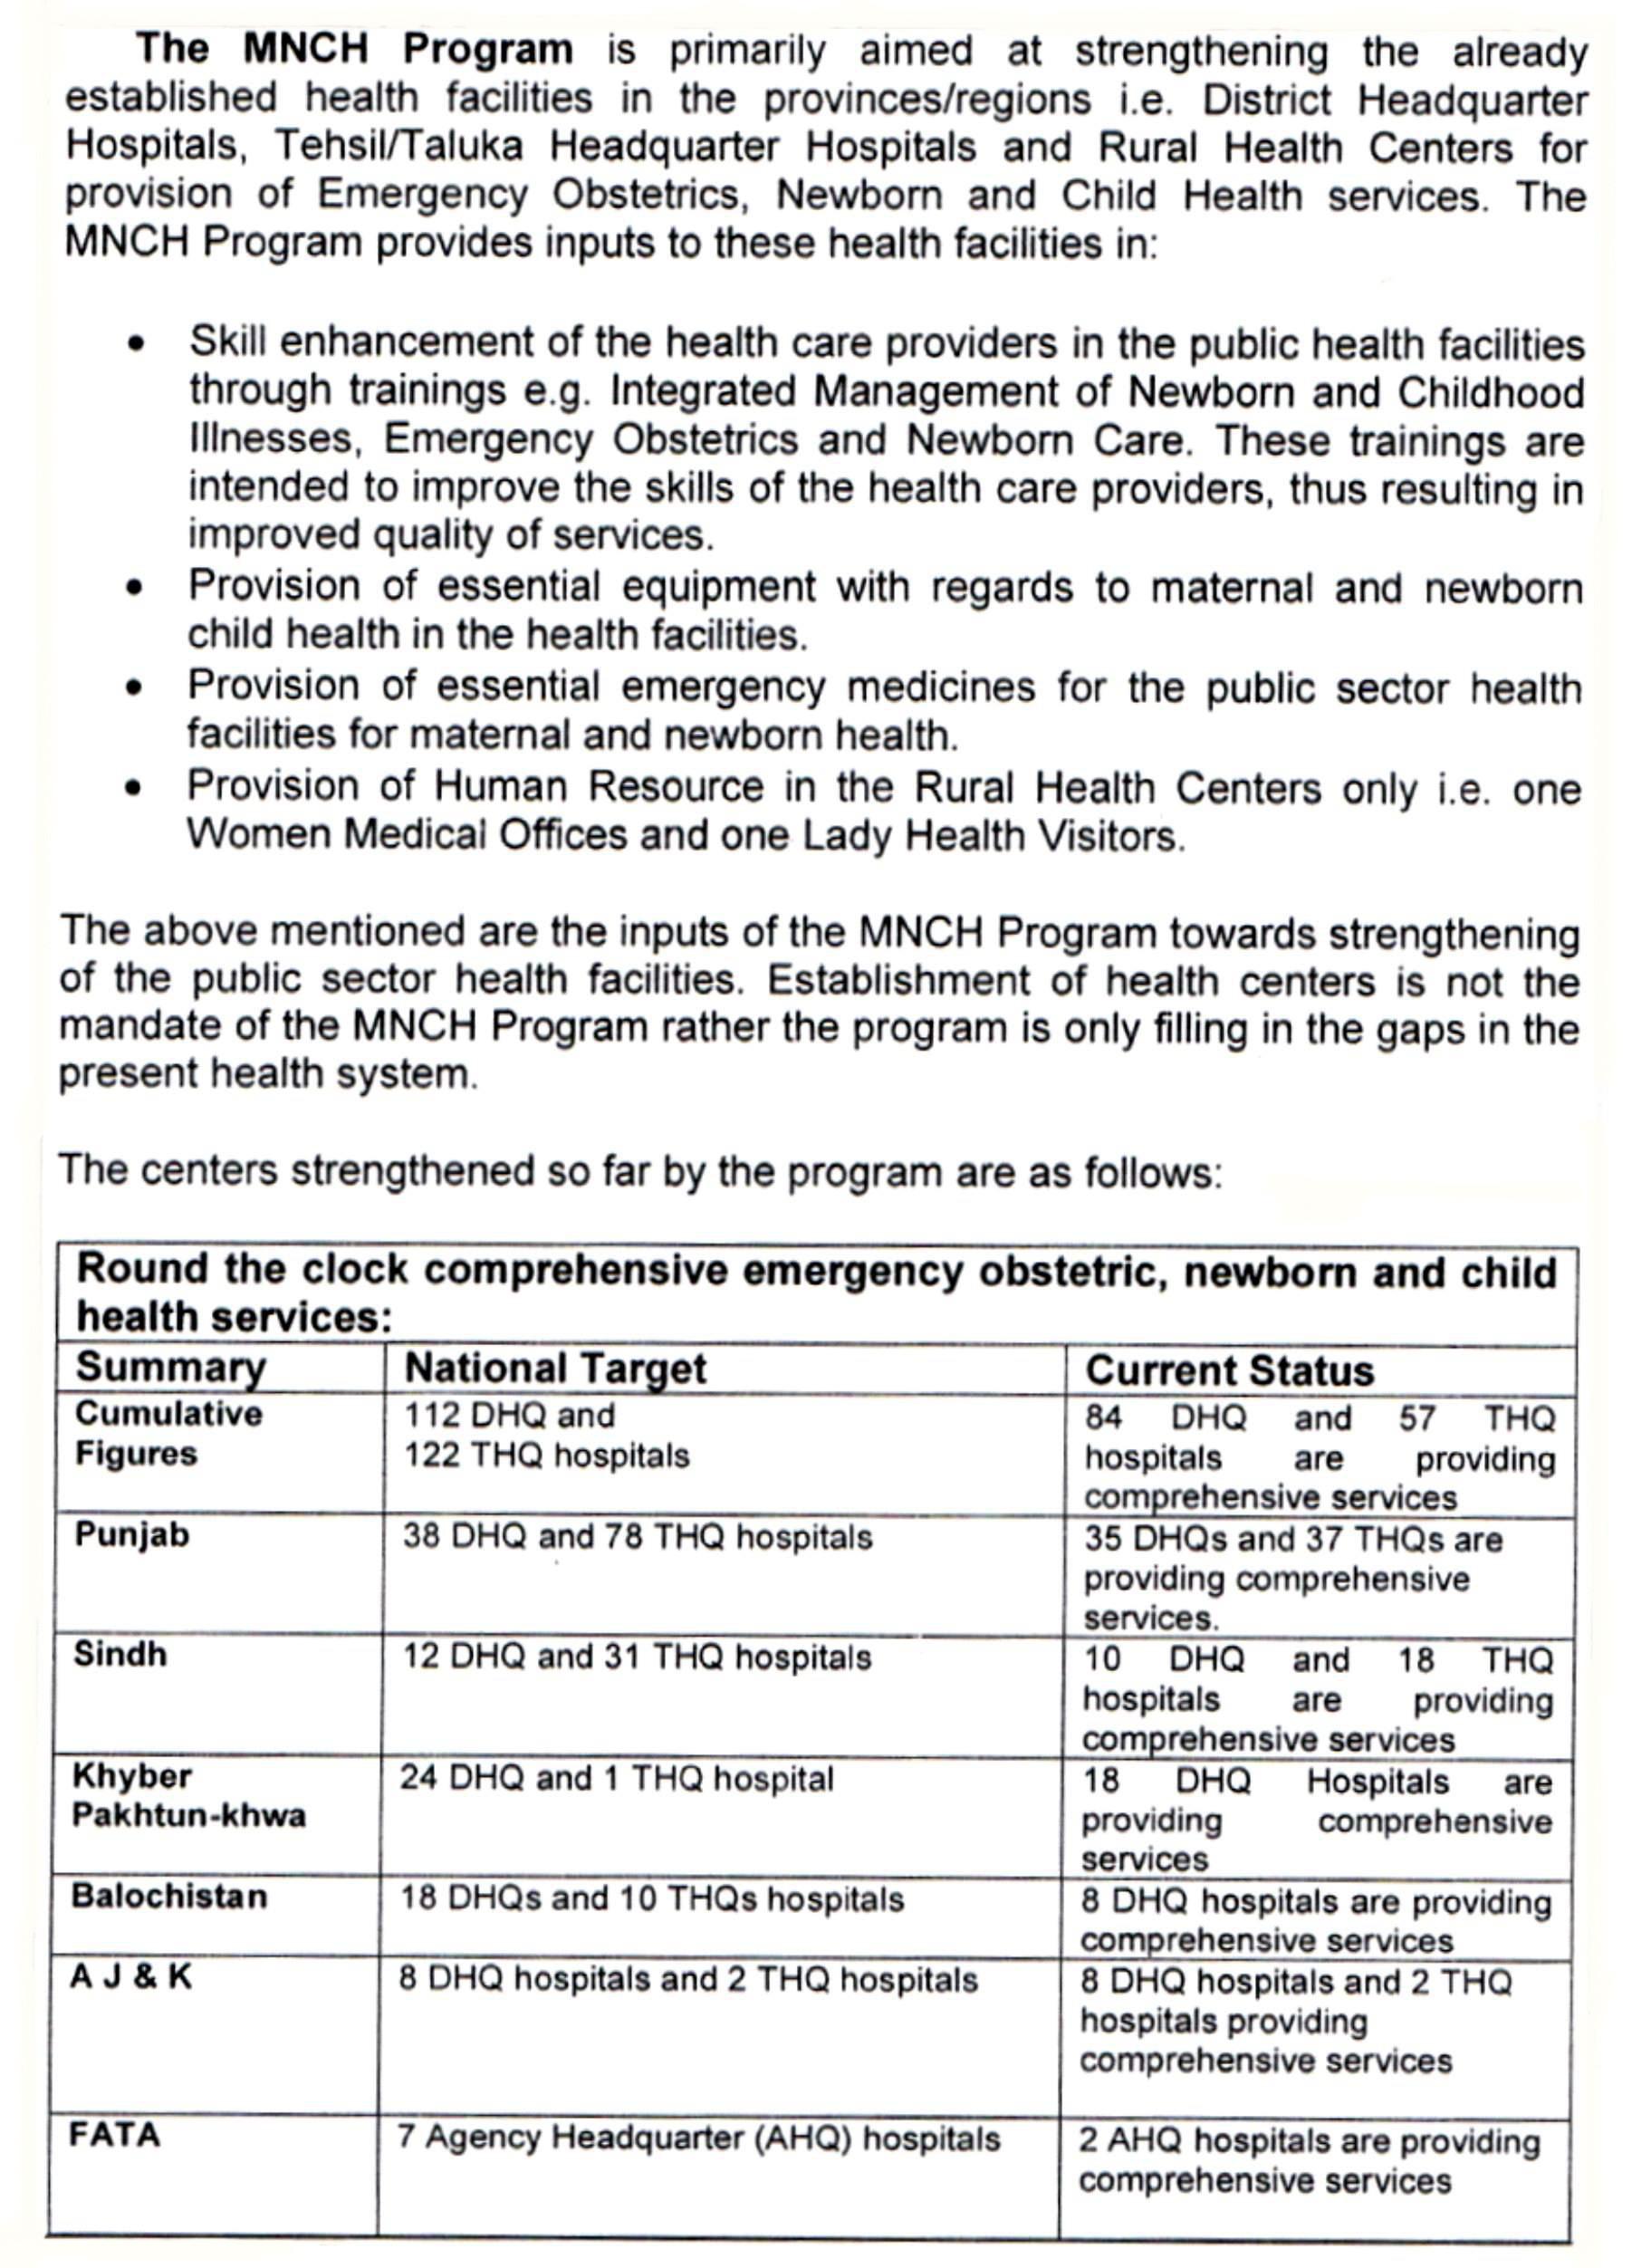 National MNCH Program - Emergency Obstetric Care